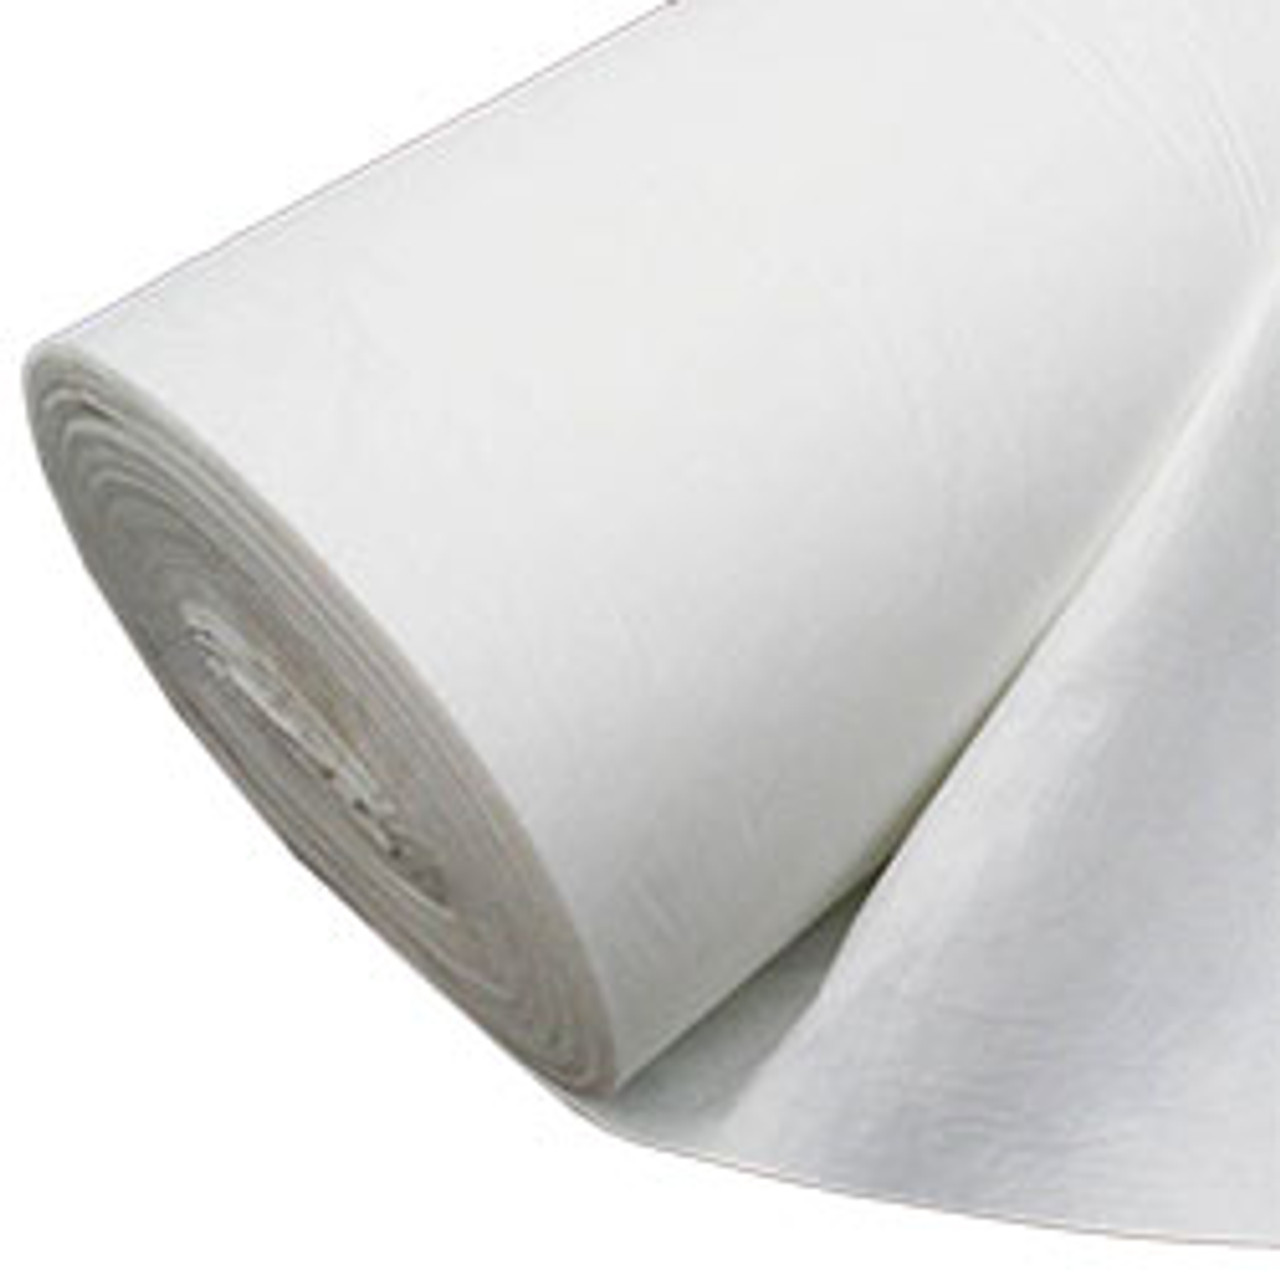 4.5m x 10m Non Woven Geotextile Minipack